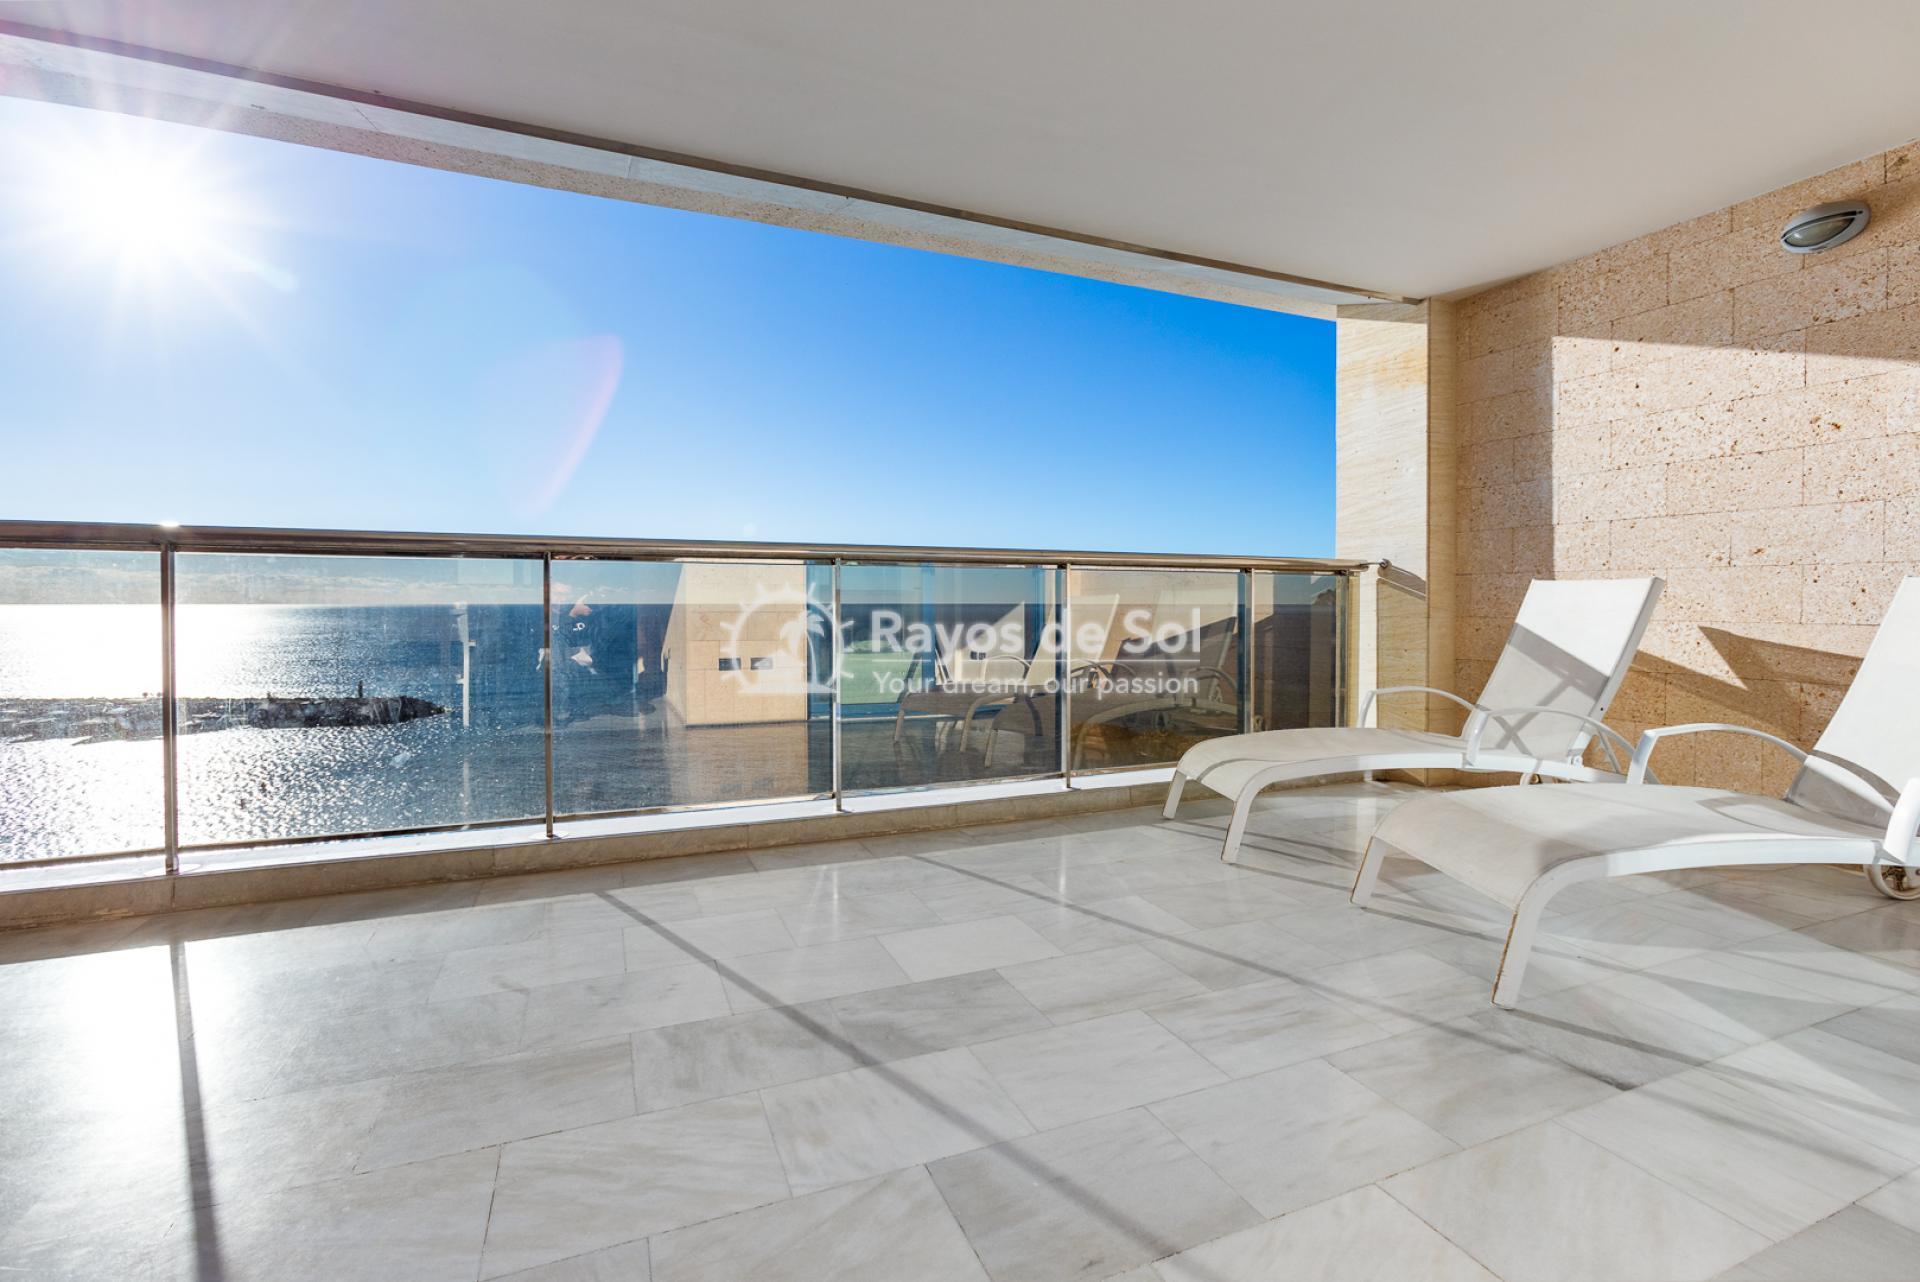 Turnekey first line apartments  in Altea, Costa Blanca (Alteabeach) - 5